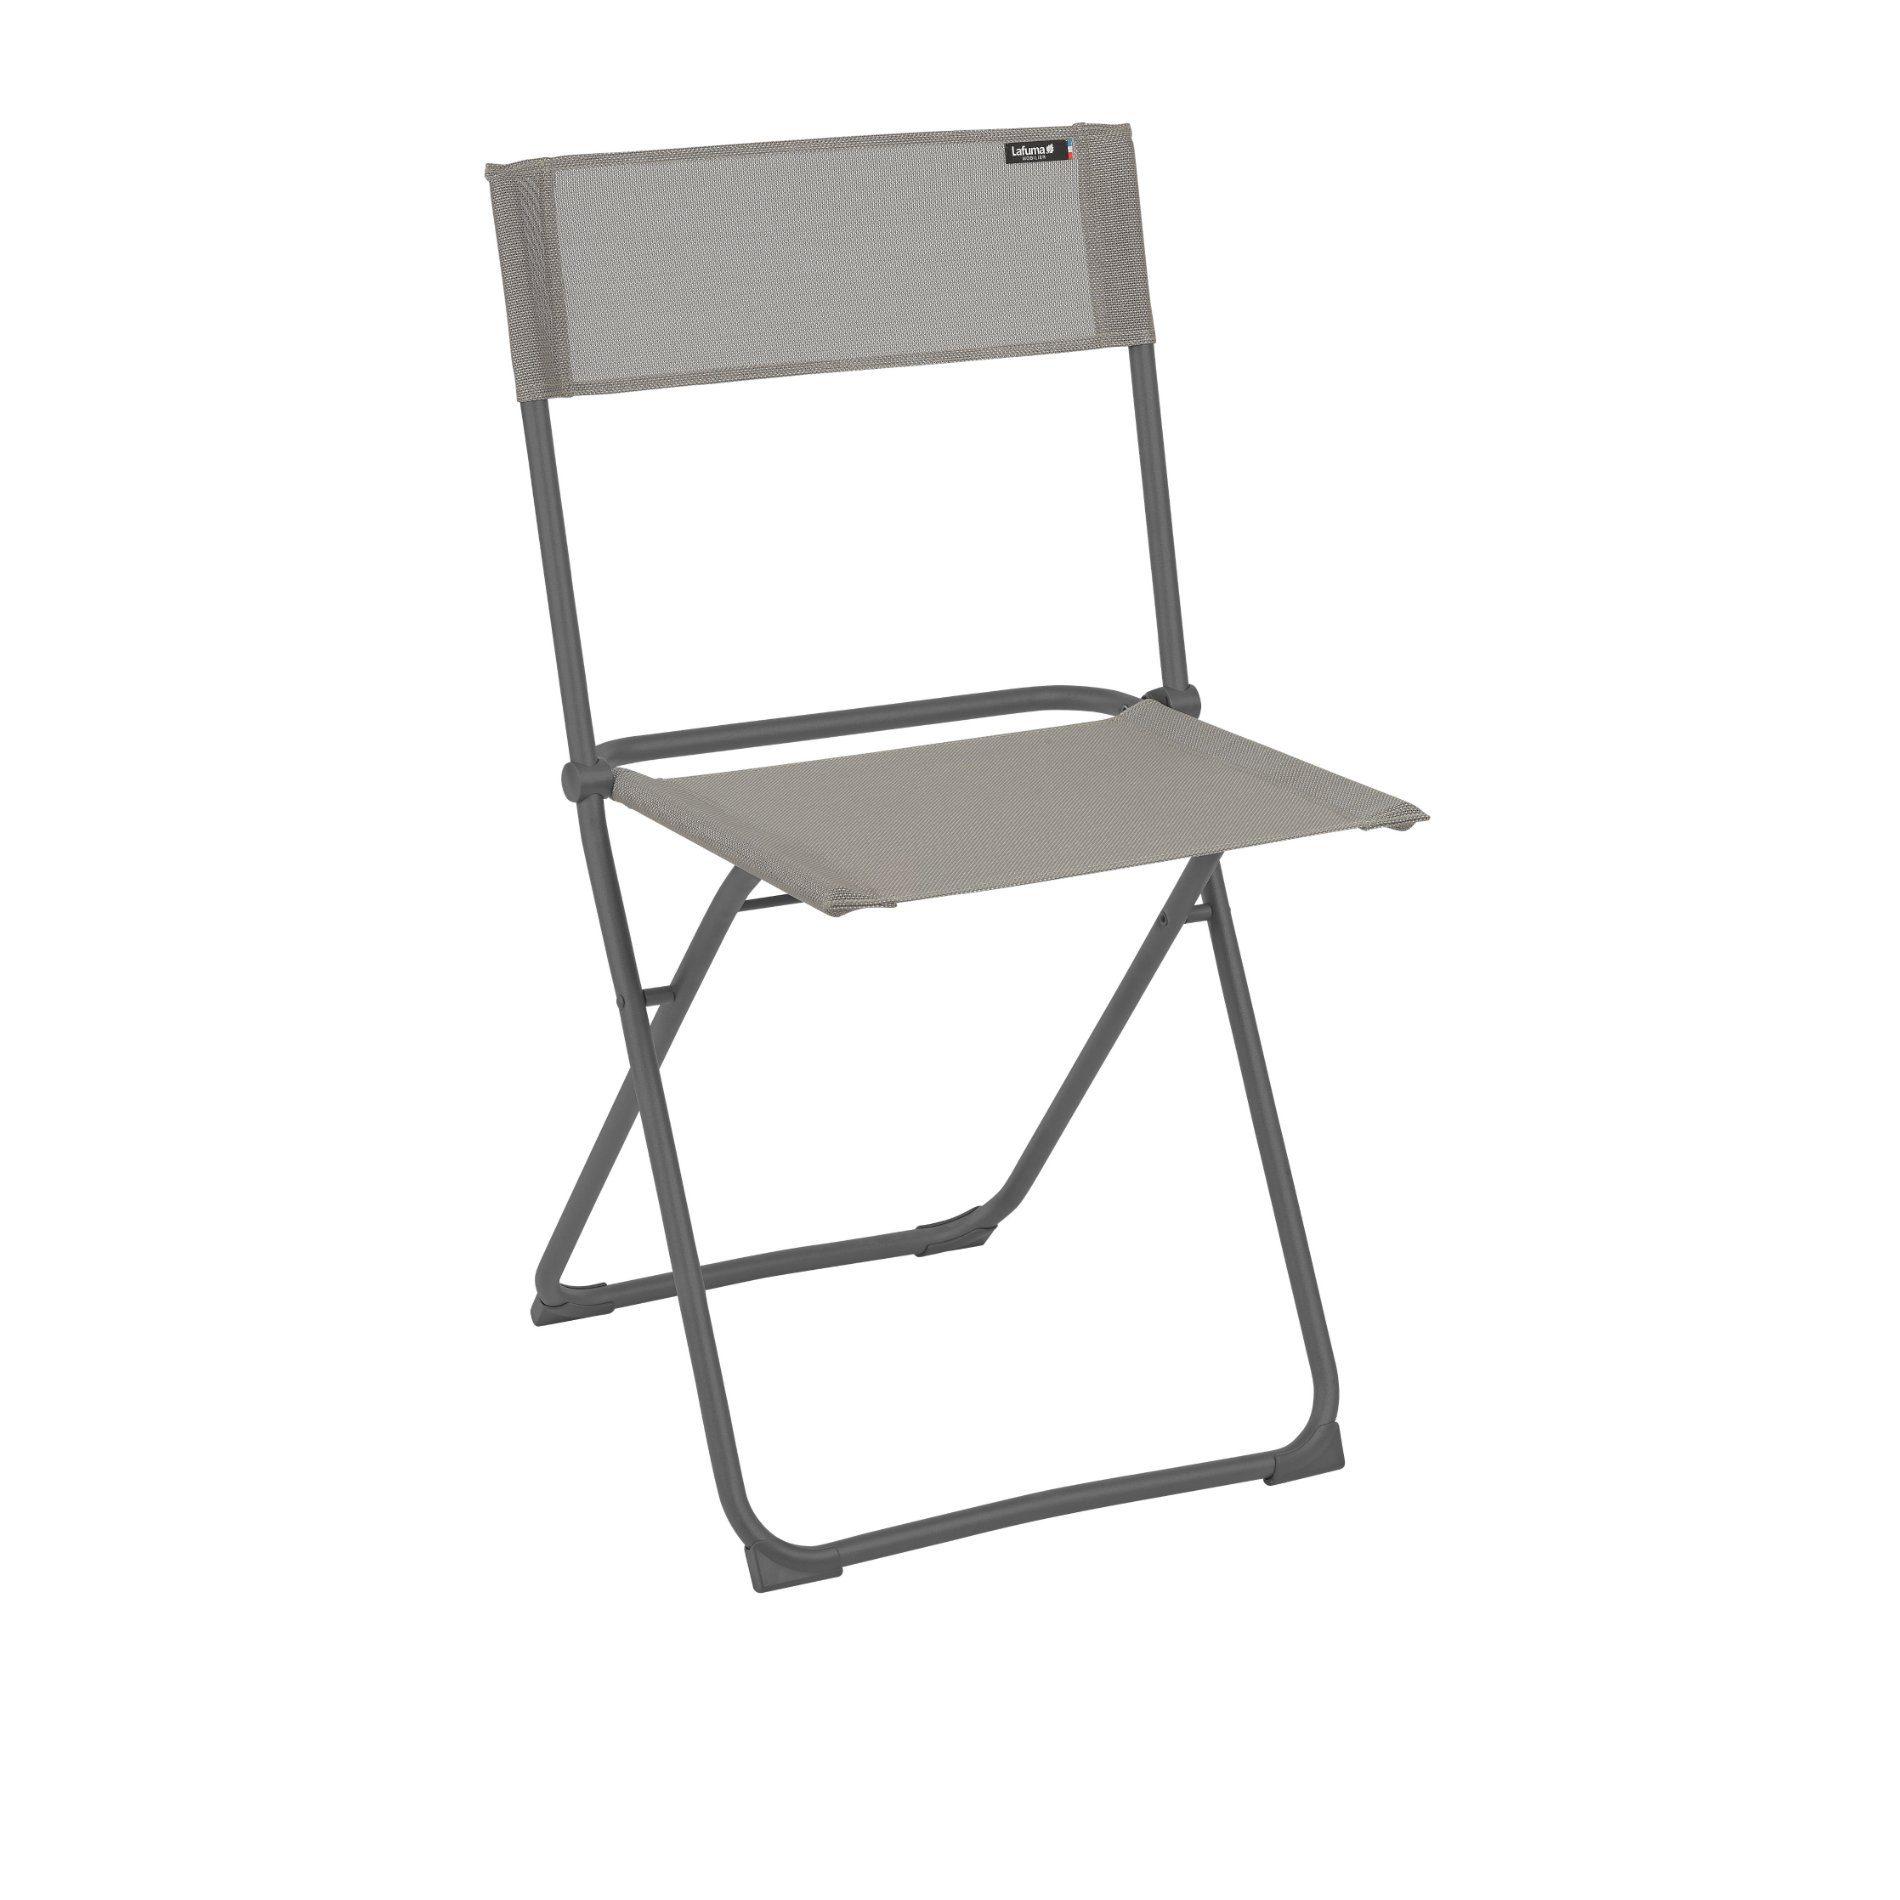 lafuma ersatzbezug elegant lafuma shift goretex windjacken billig liege xlgnstig kaufen online. Black Bedroom Furniture Sets. Home Design Ideas